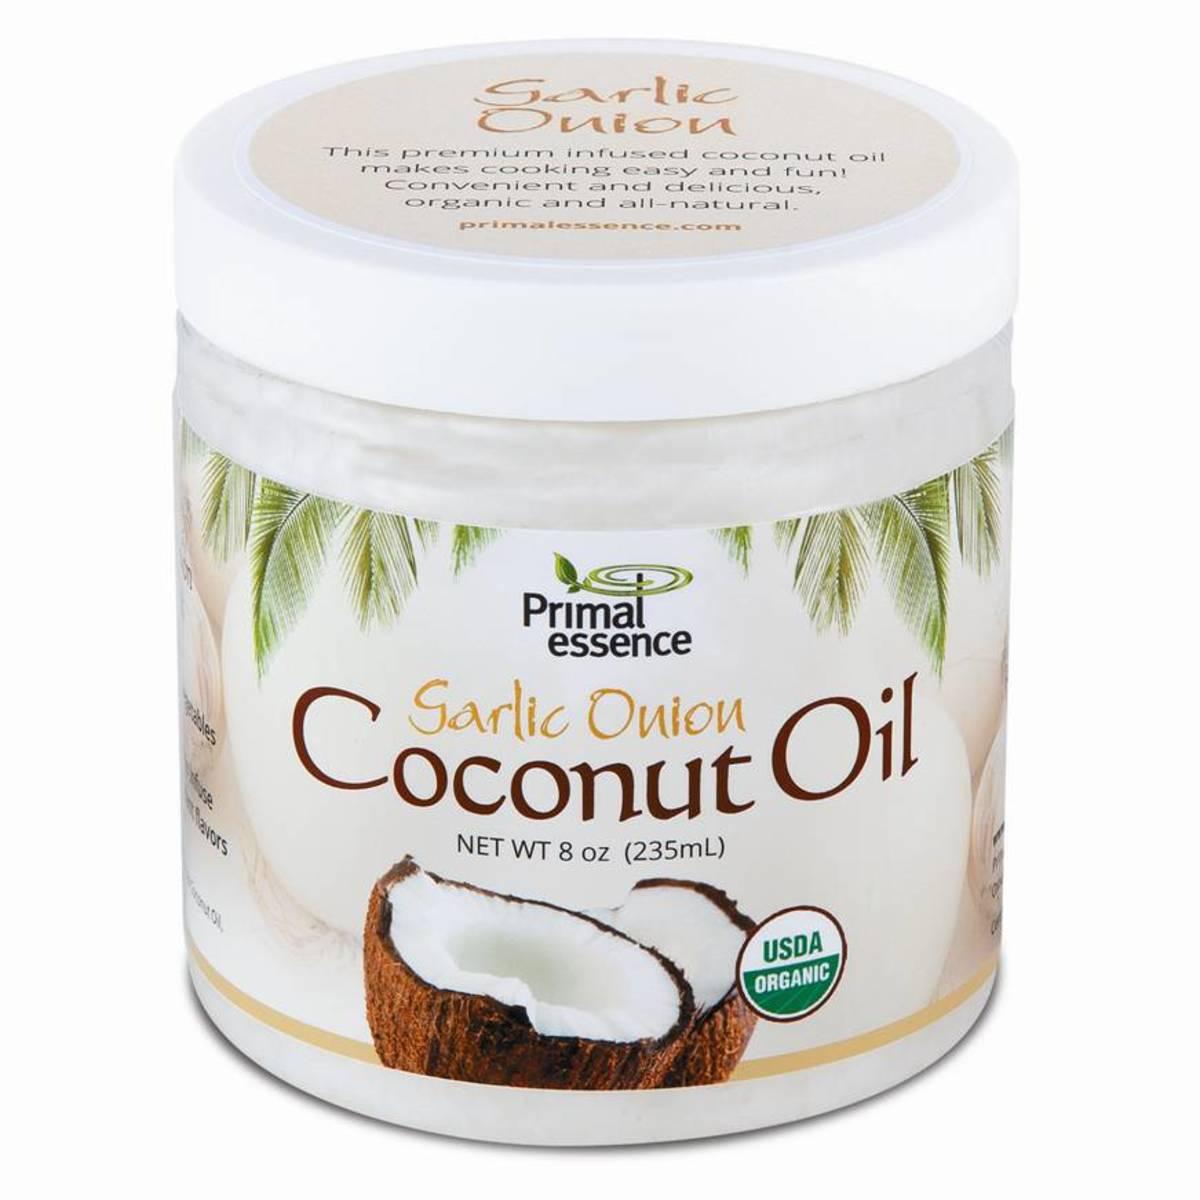 Primal Essence Garlic Onion Coconut Oil